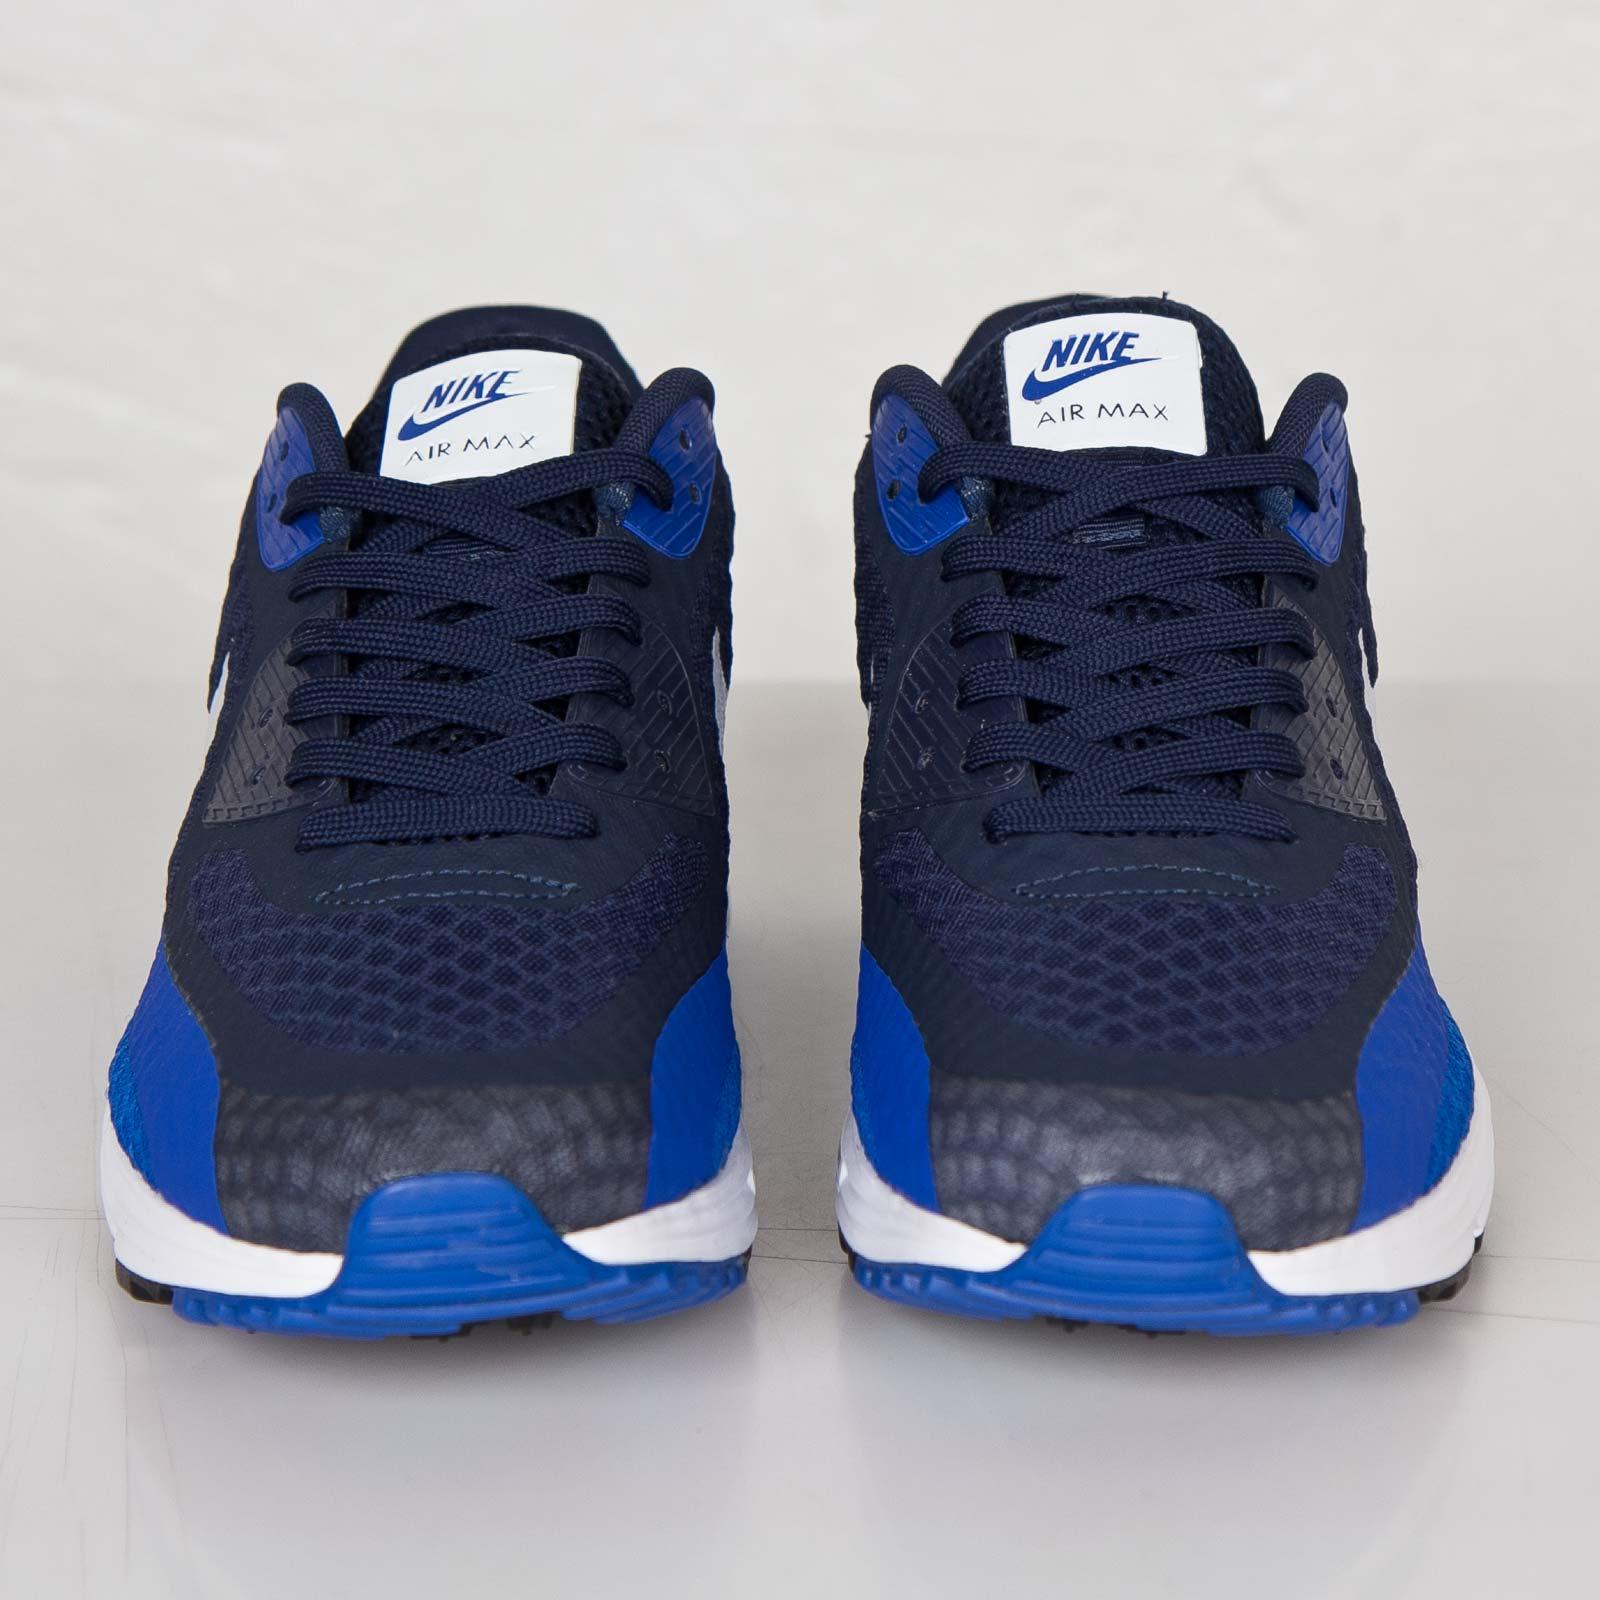 the latest 98c21 f2c80 Nike Air Max Lunar90 Breeze - 724078-400 - Sneakersnstuff   sneakers    streetwear online since 1999